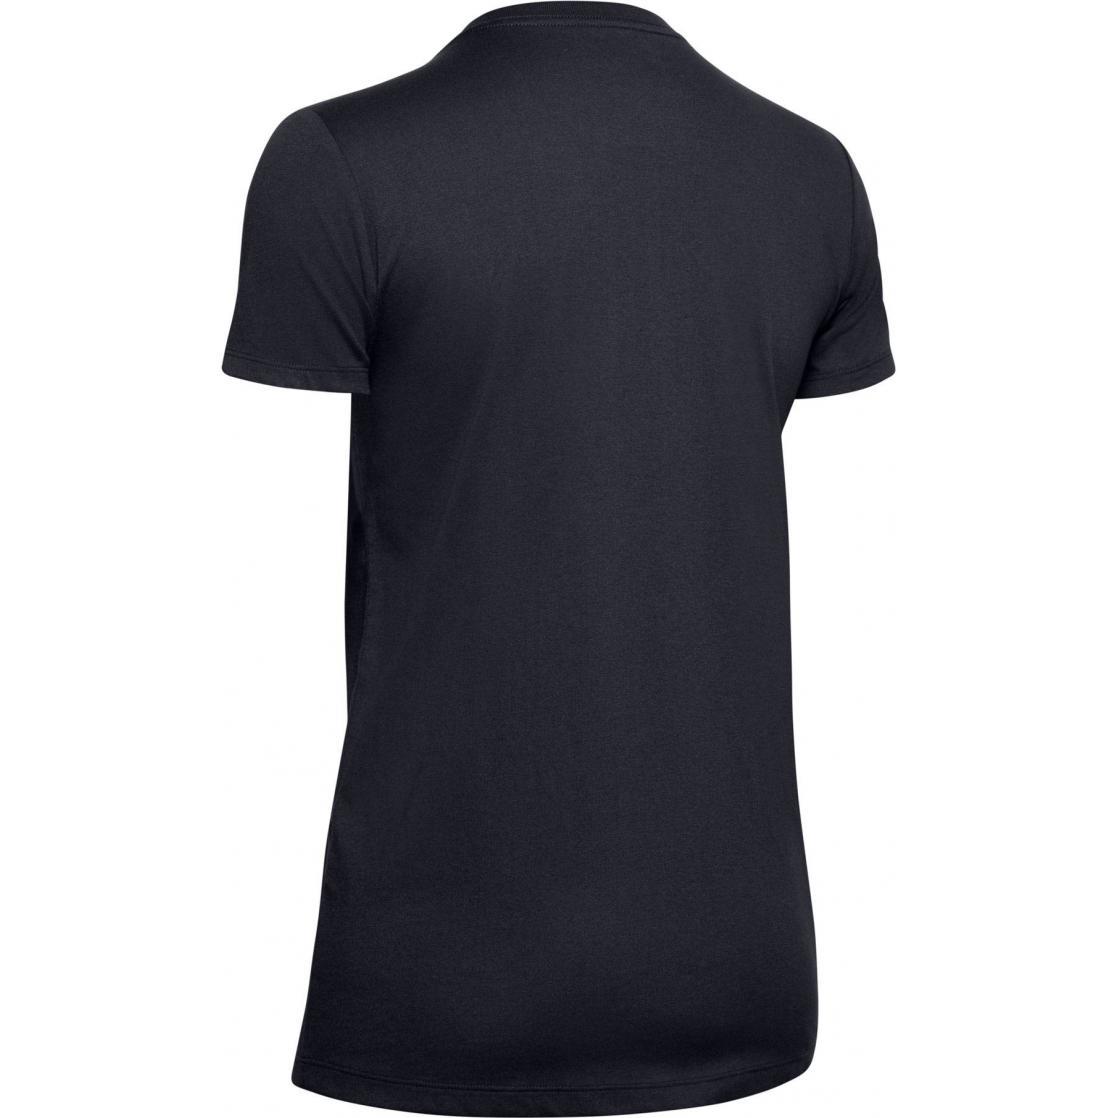 Damski T-shirt Under Armour czarny